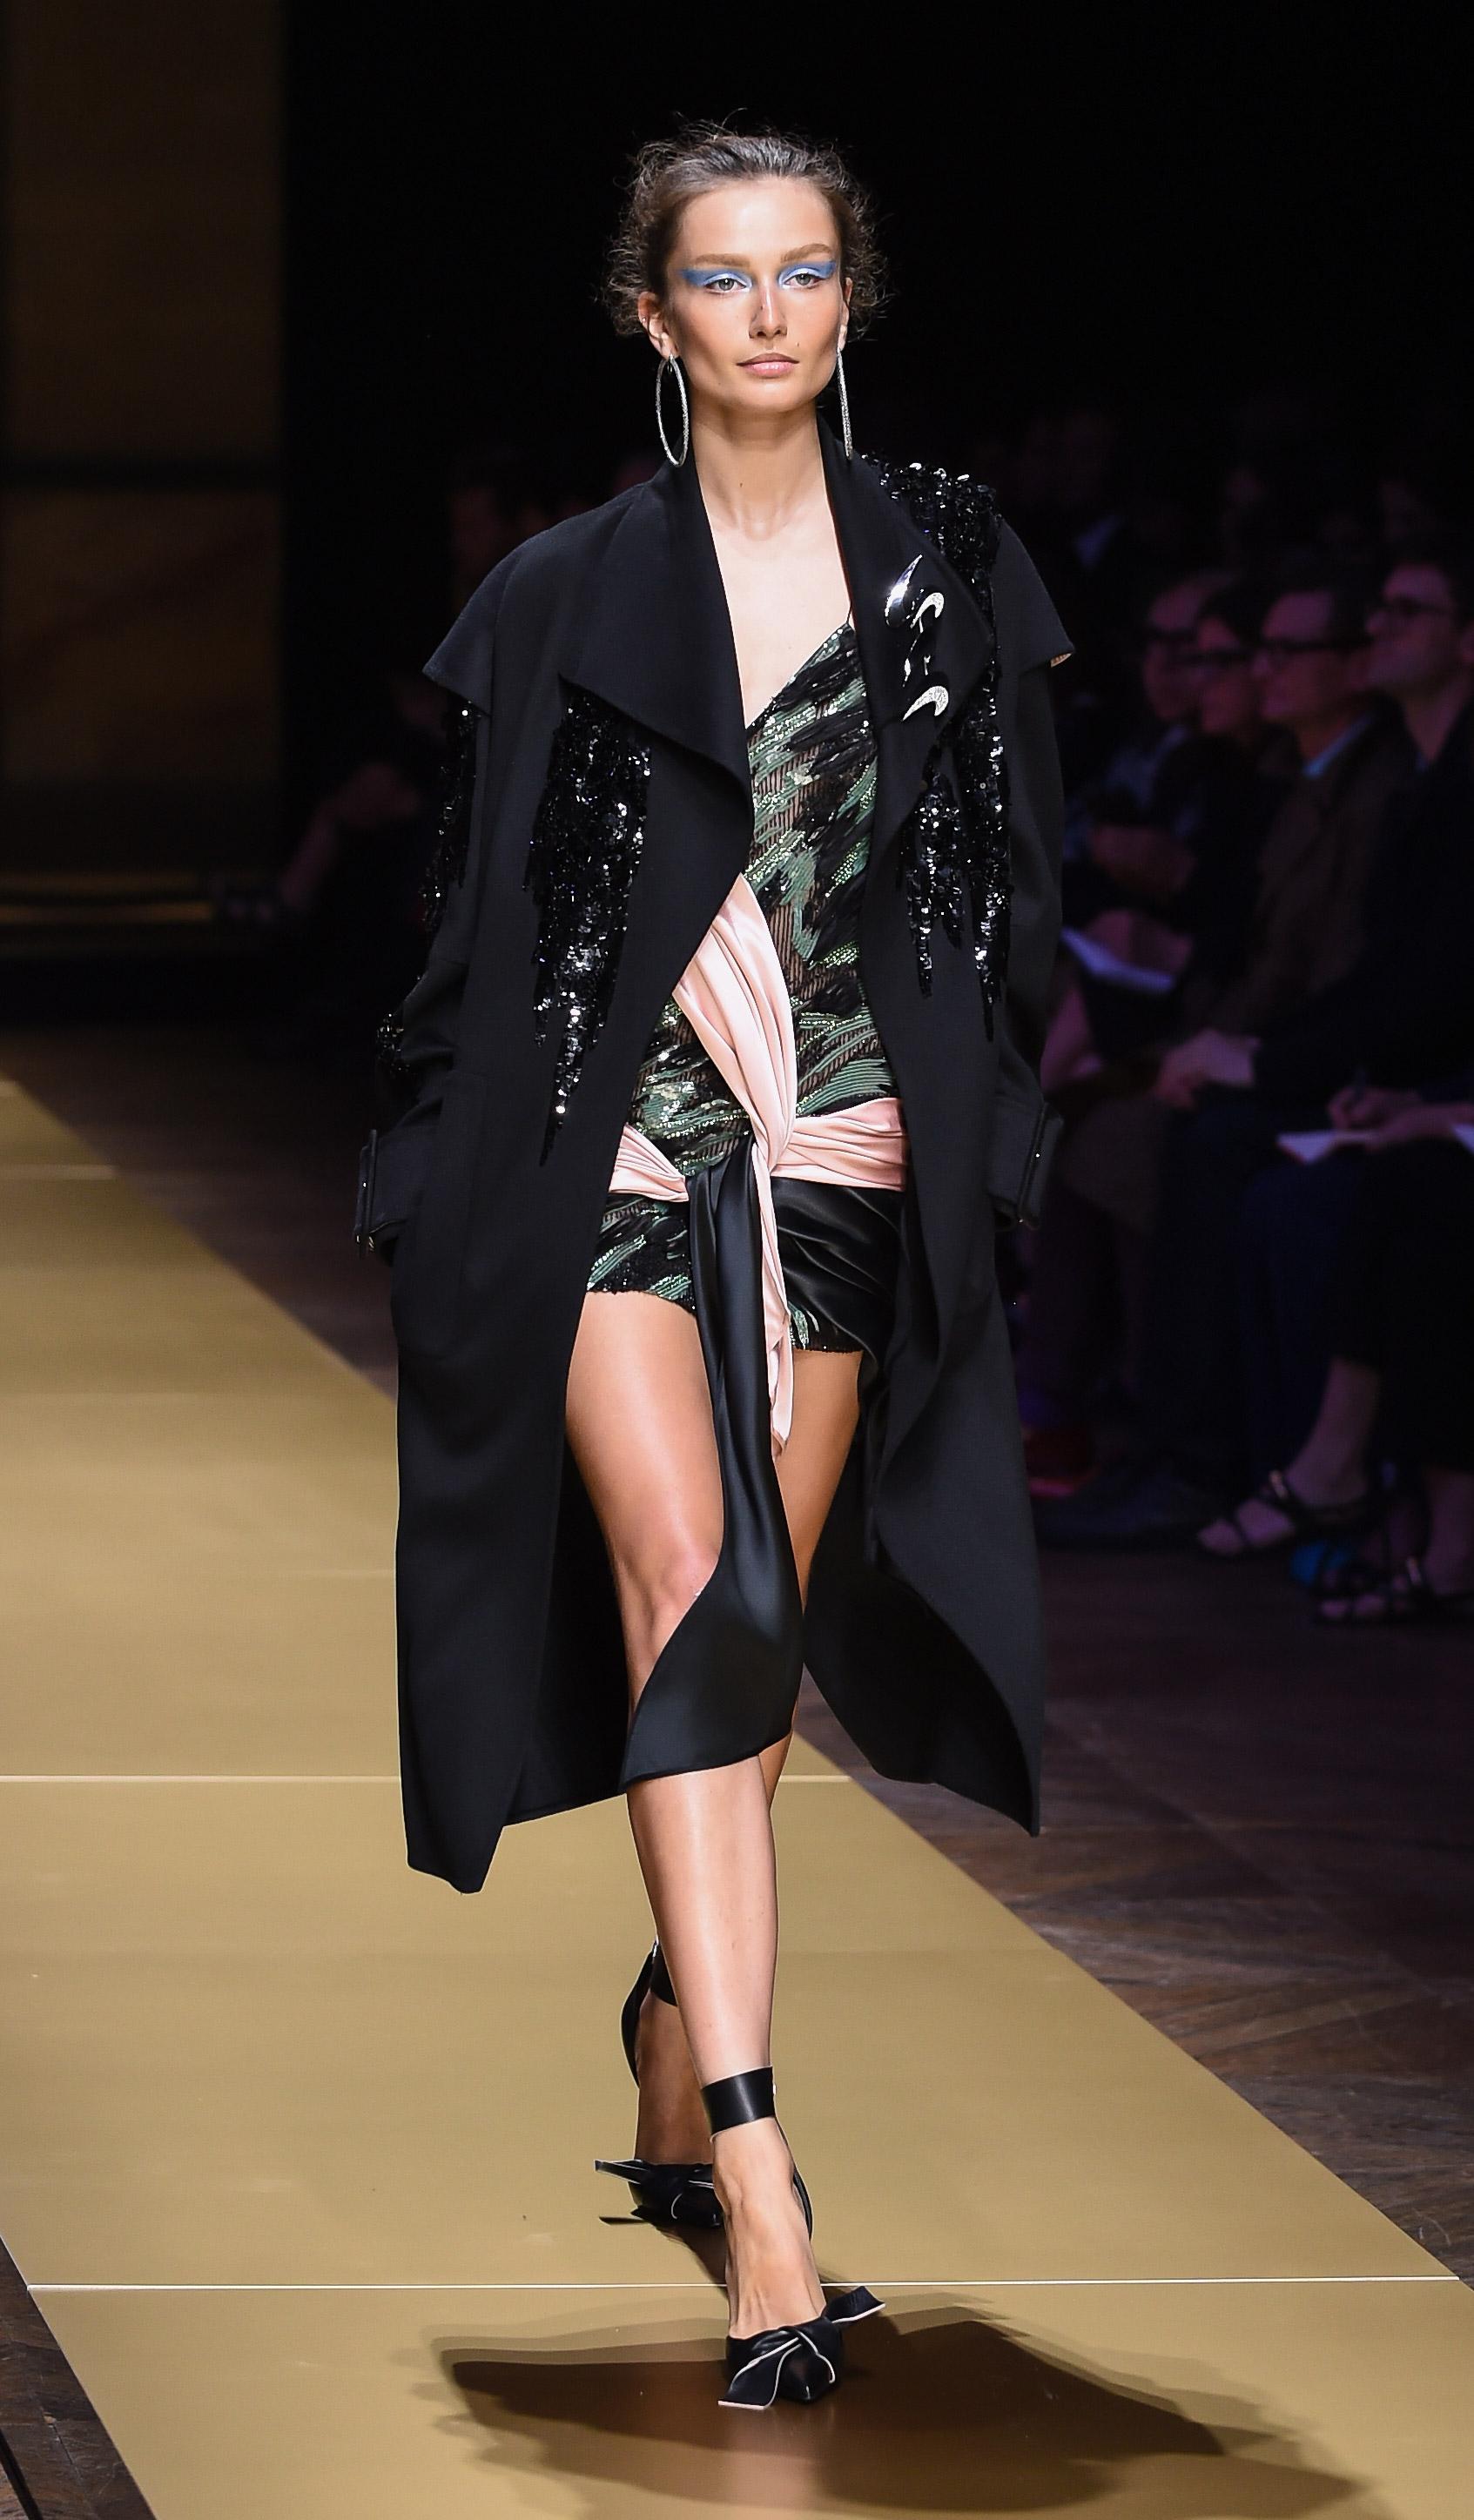 Atelier Versace Haute Couture Autumn/Winter'17